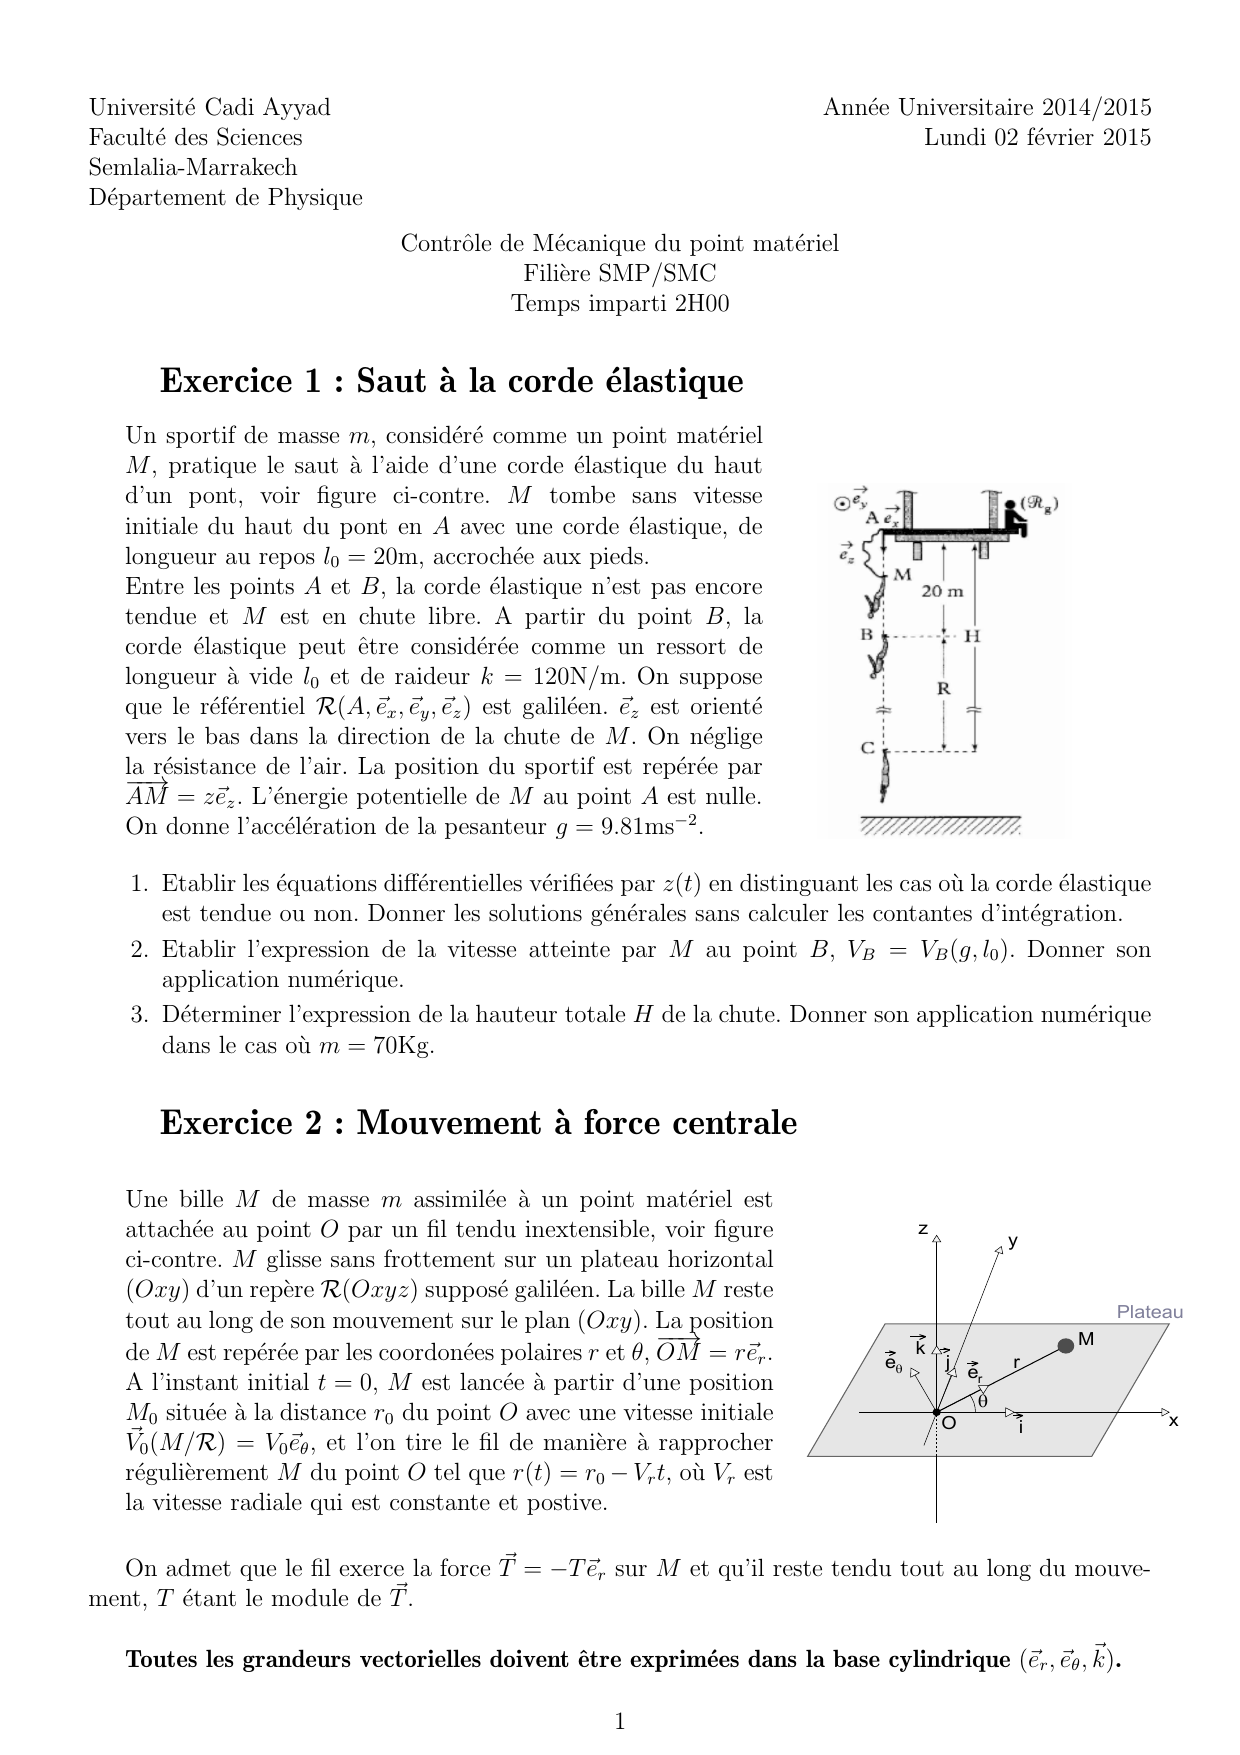 Exercice 1 Saut A La Corde Elastique Exercice 2 Mouvement A